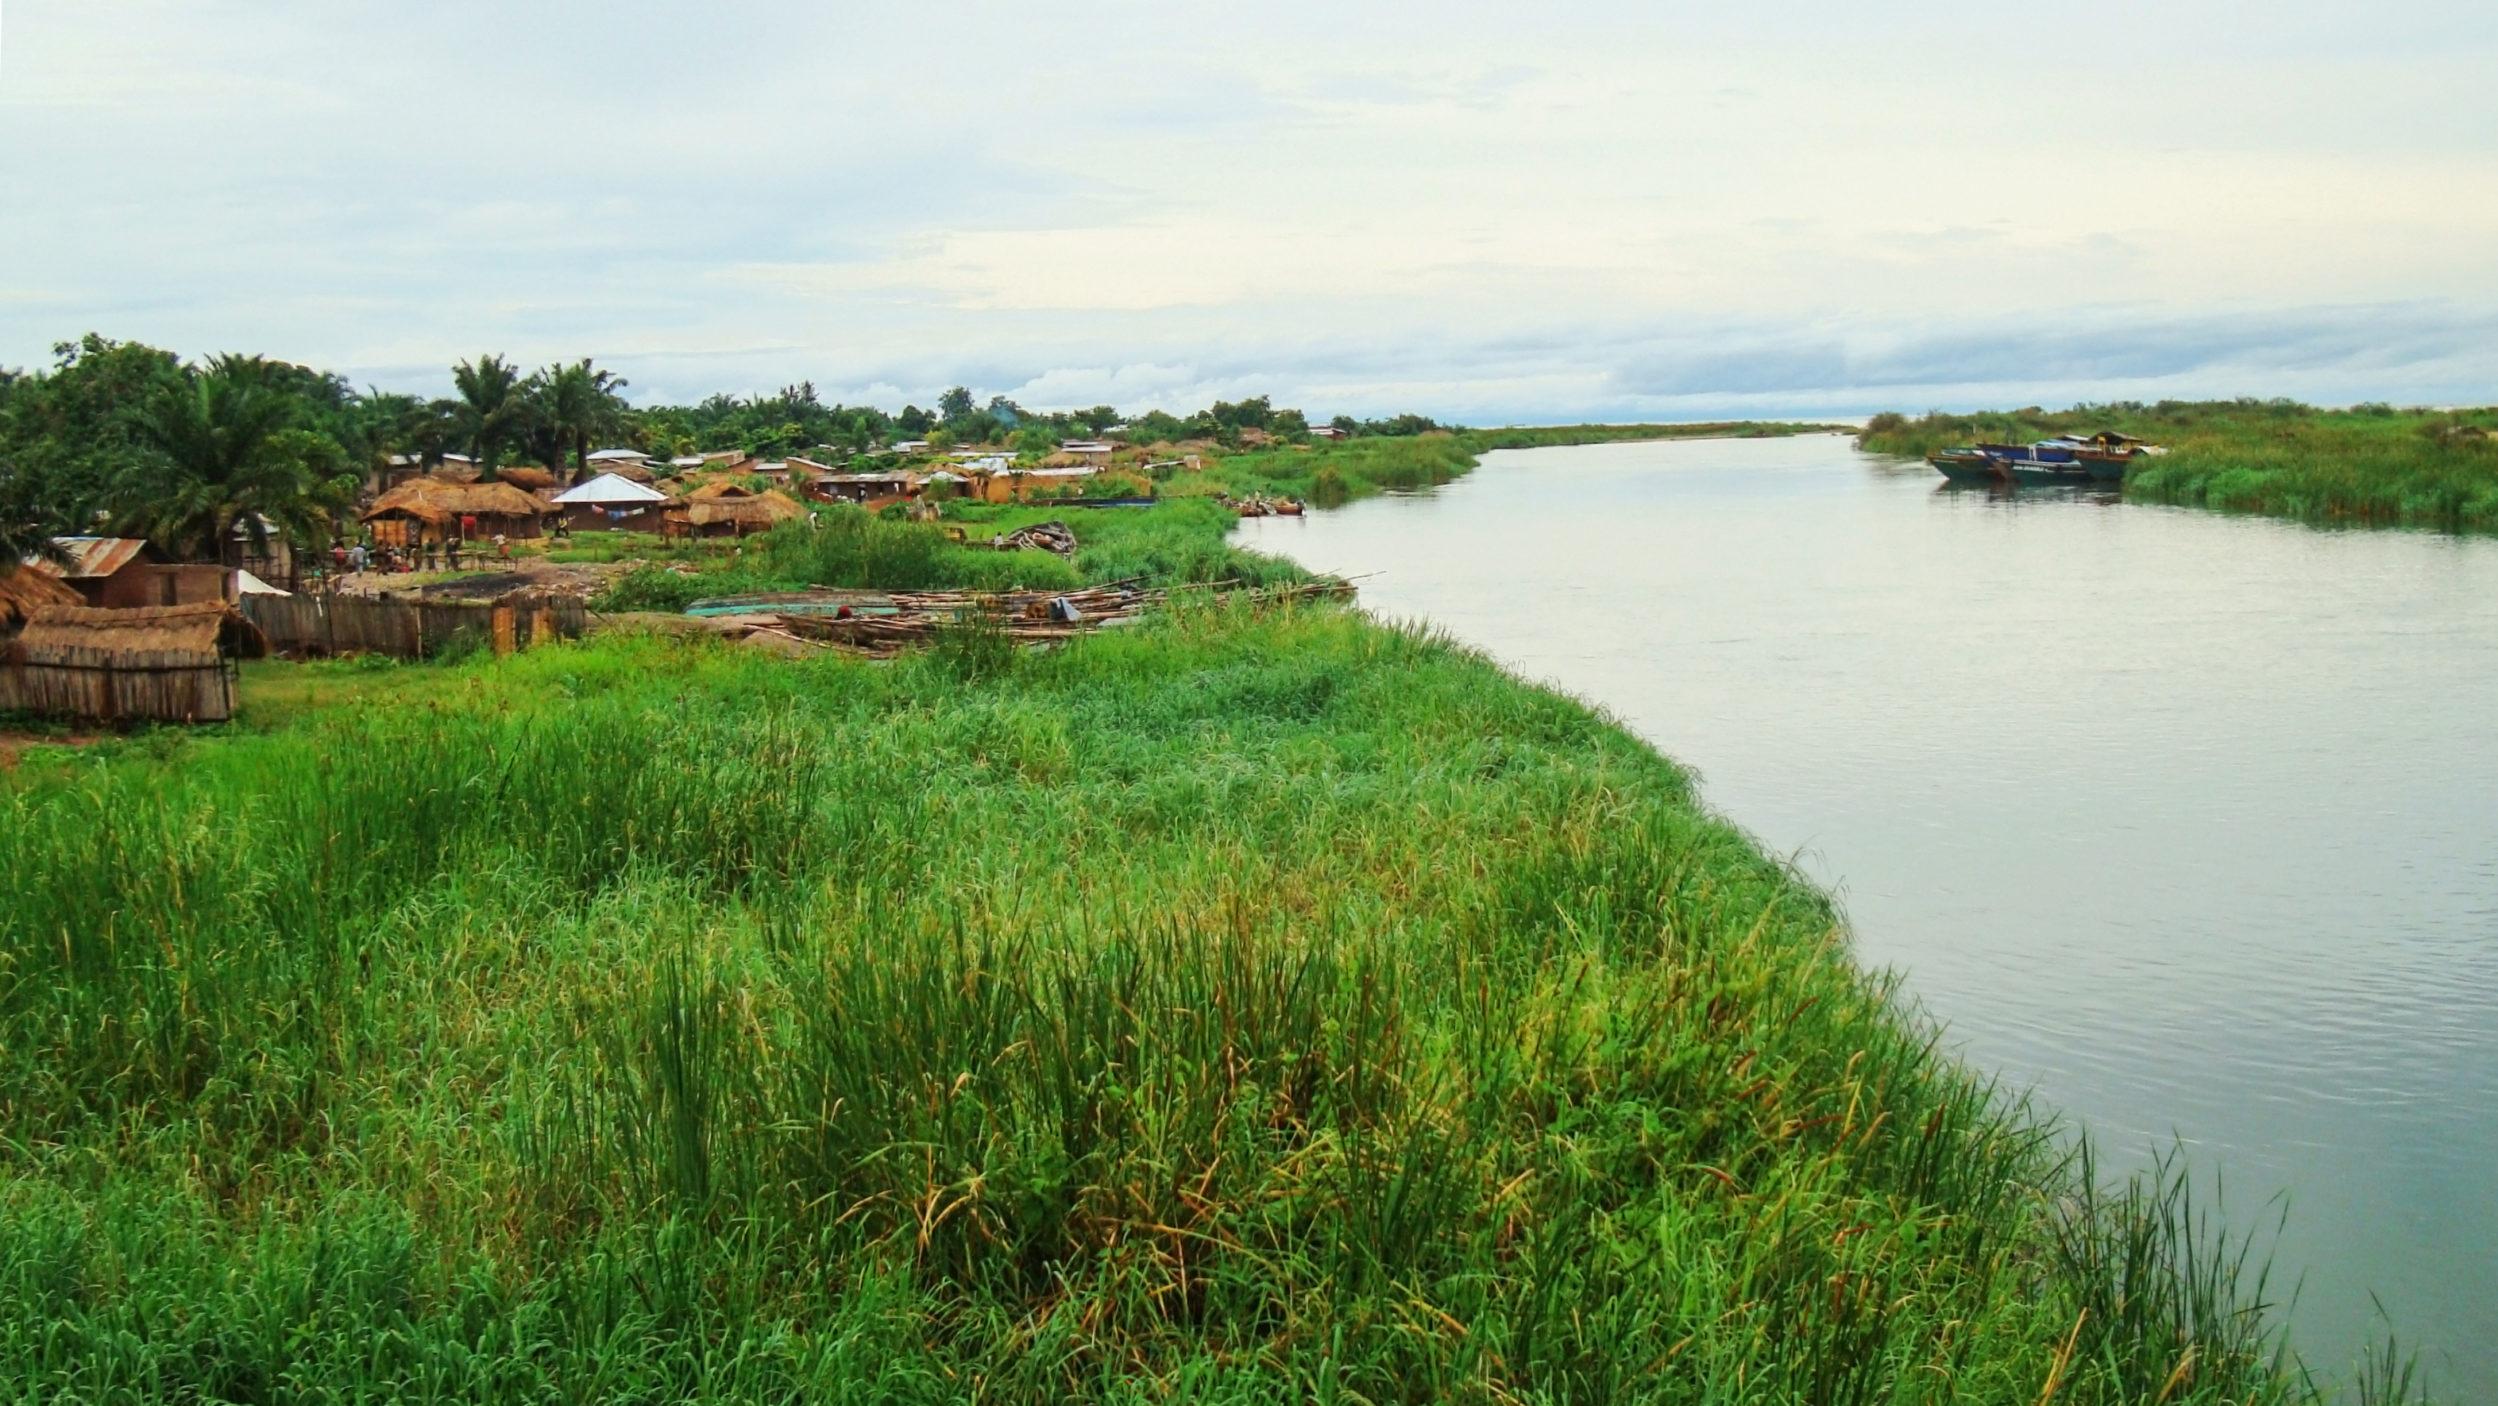 Republic Of The Congo [shutterstock]